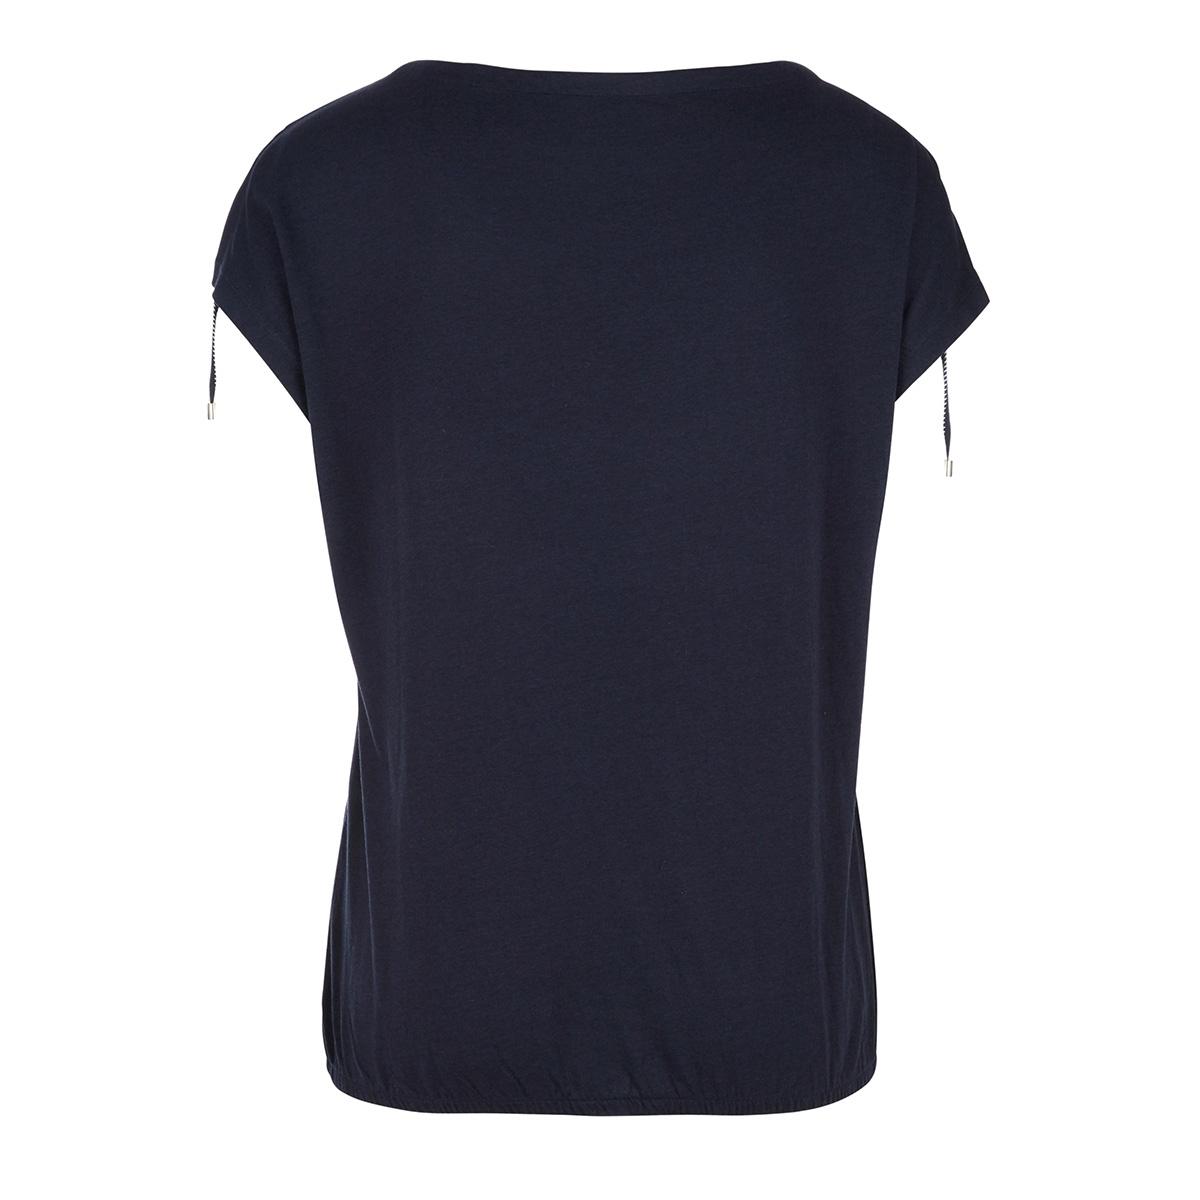 t shirt 04899325347 s.oliver t-shirt 5959